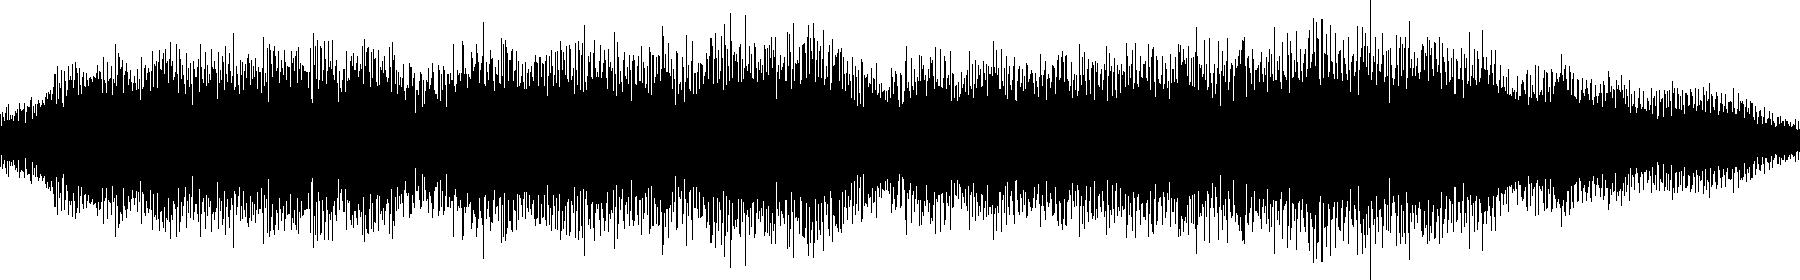 shs ch synthloop 127 padanalog cm